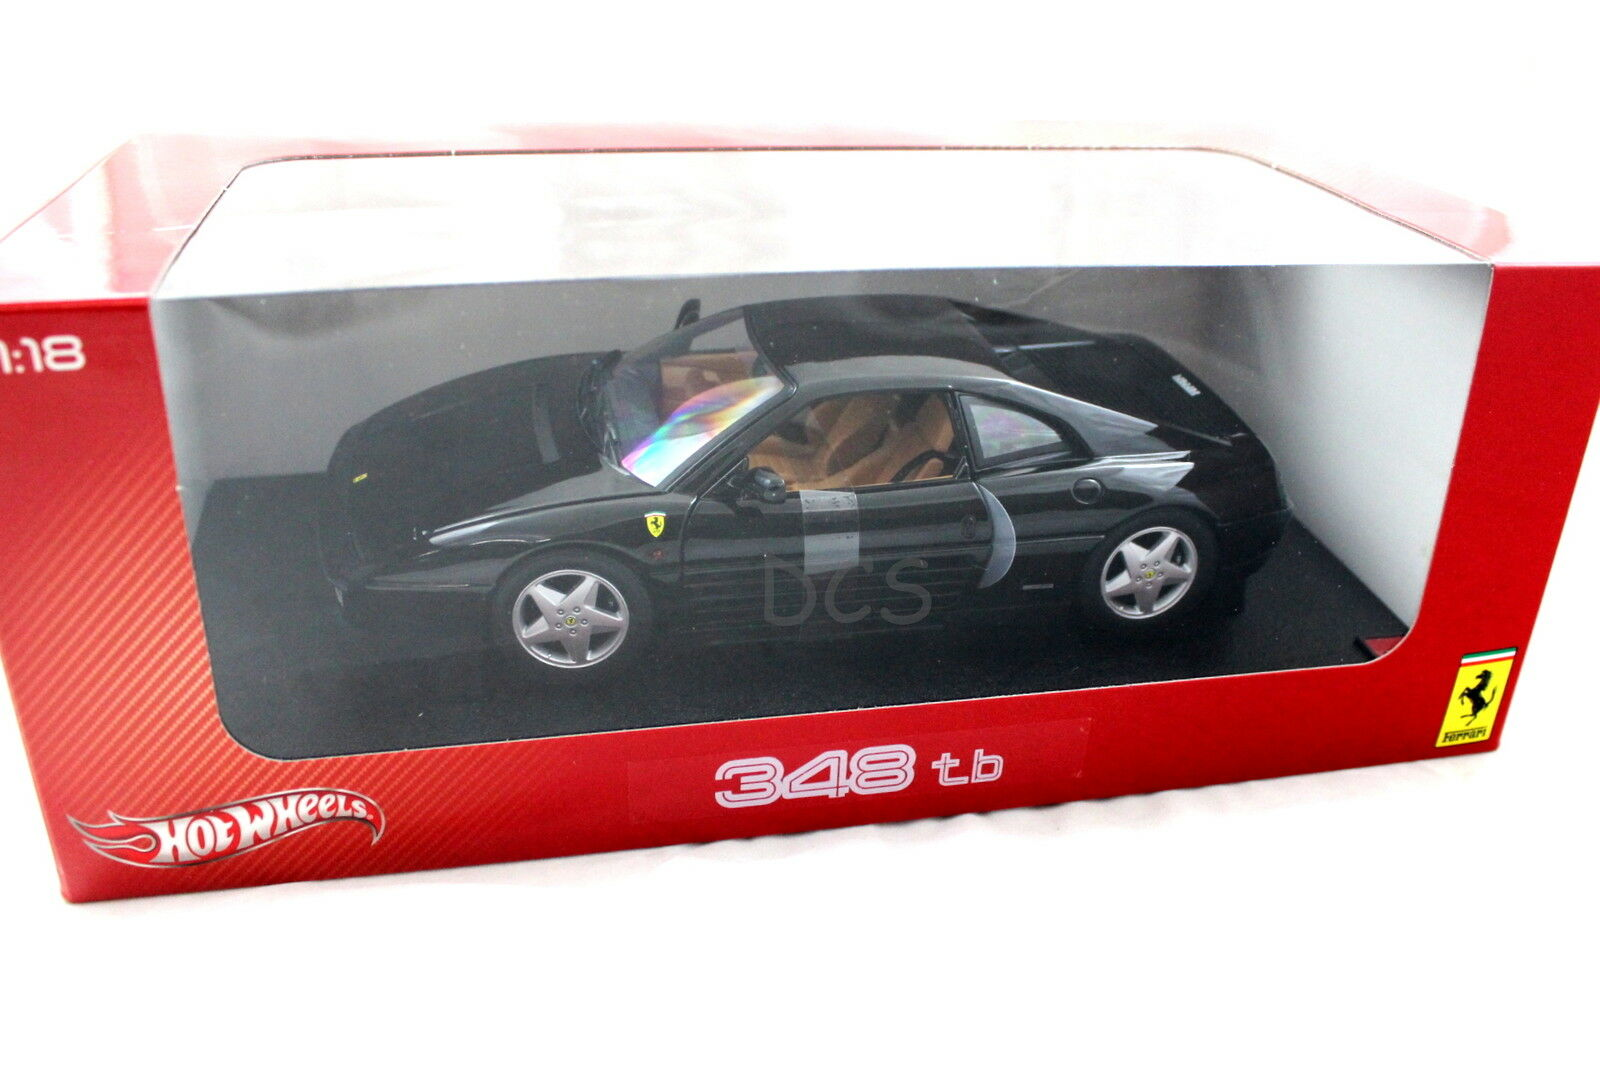 Hot Wheels Wheels Wheels 1989 Ferrari 348 Tb Negro 1 18 Diecast x5530 f12e6a